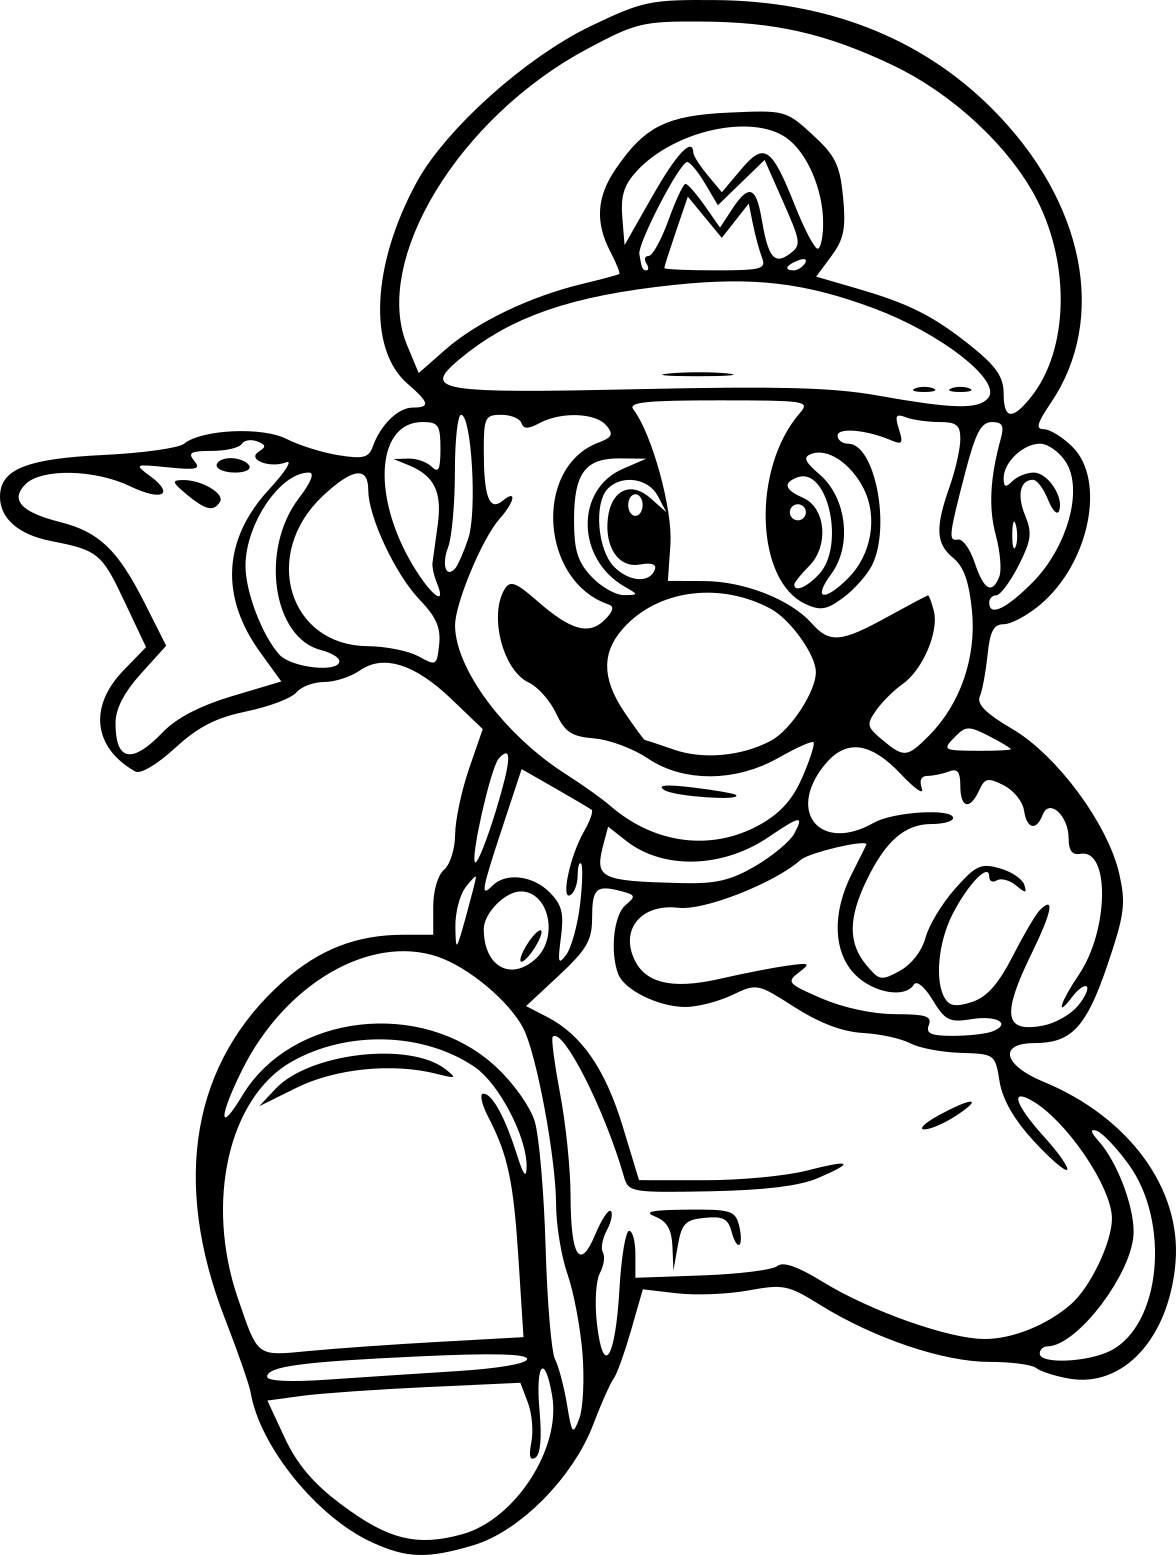 Coloriage Super Mario Run à imprimer